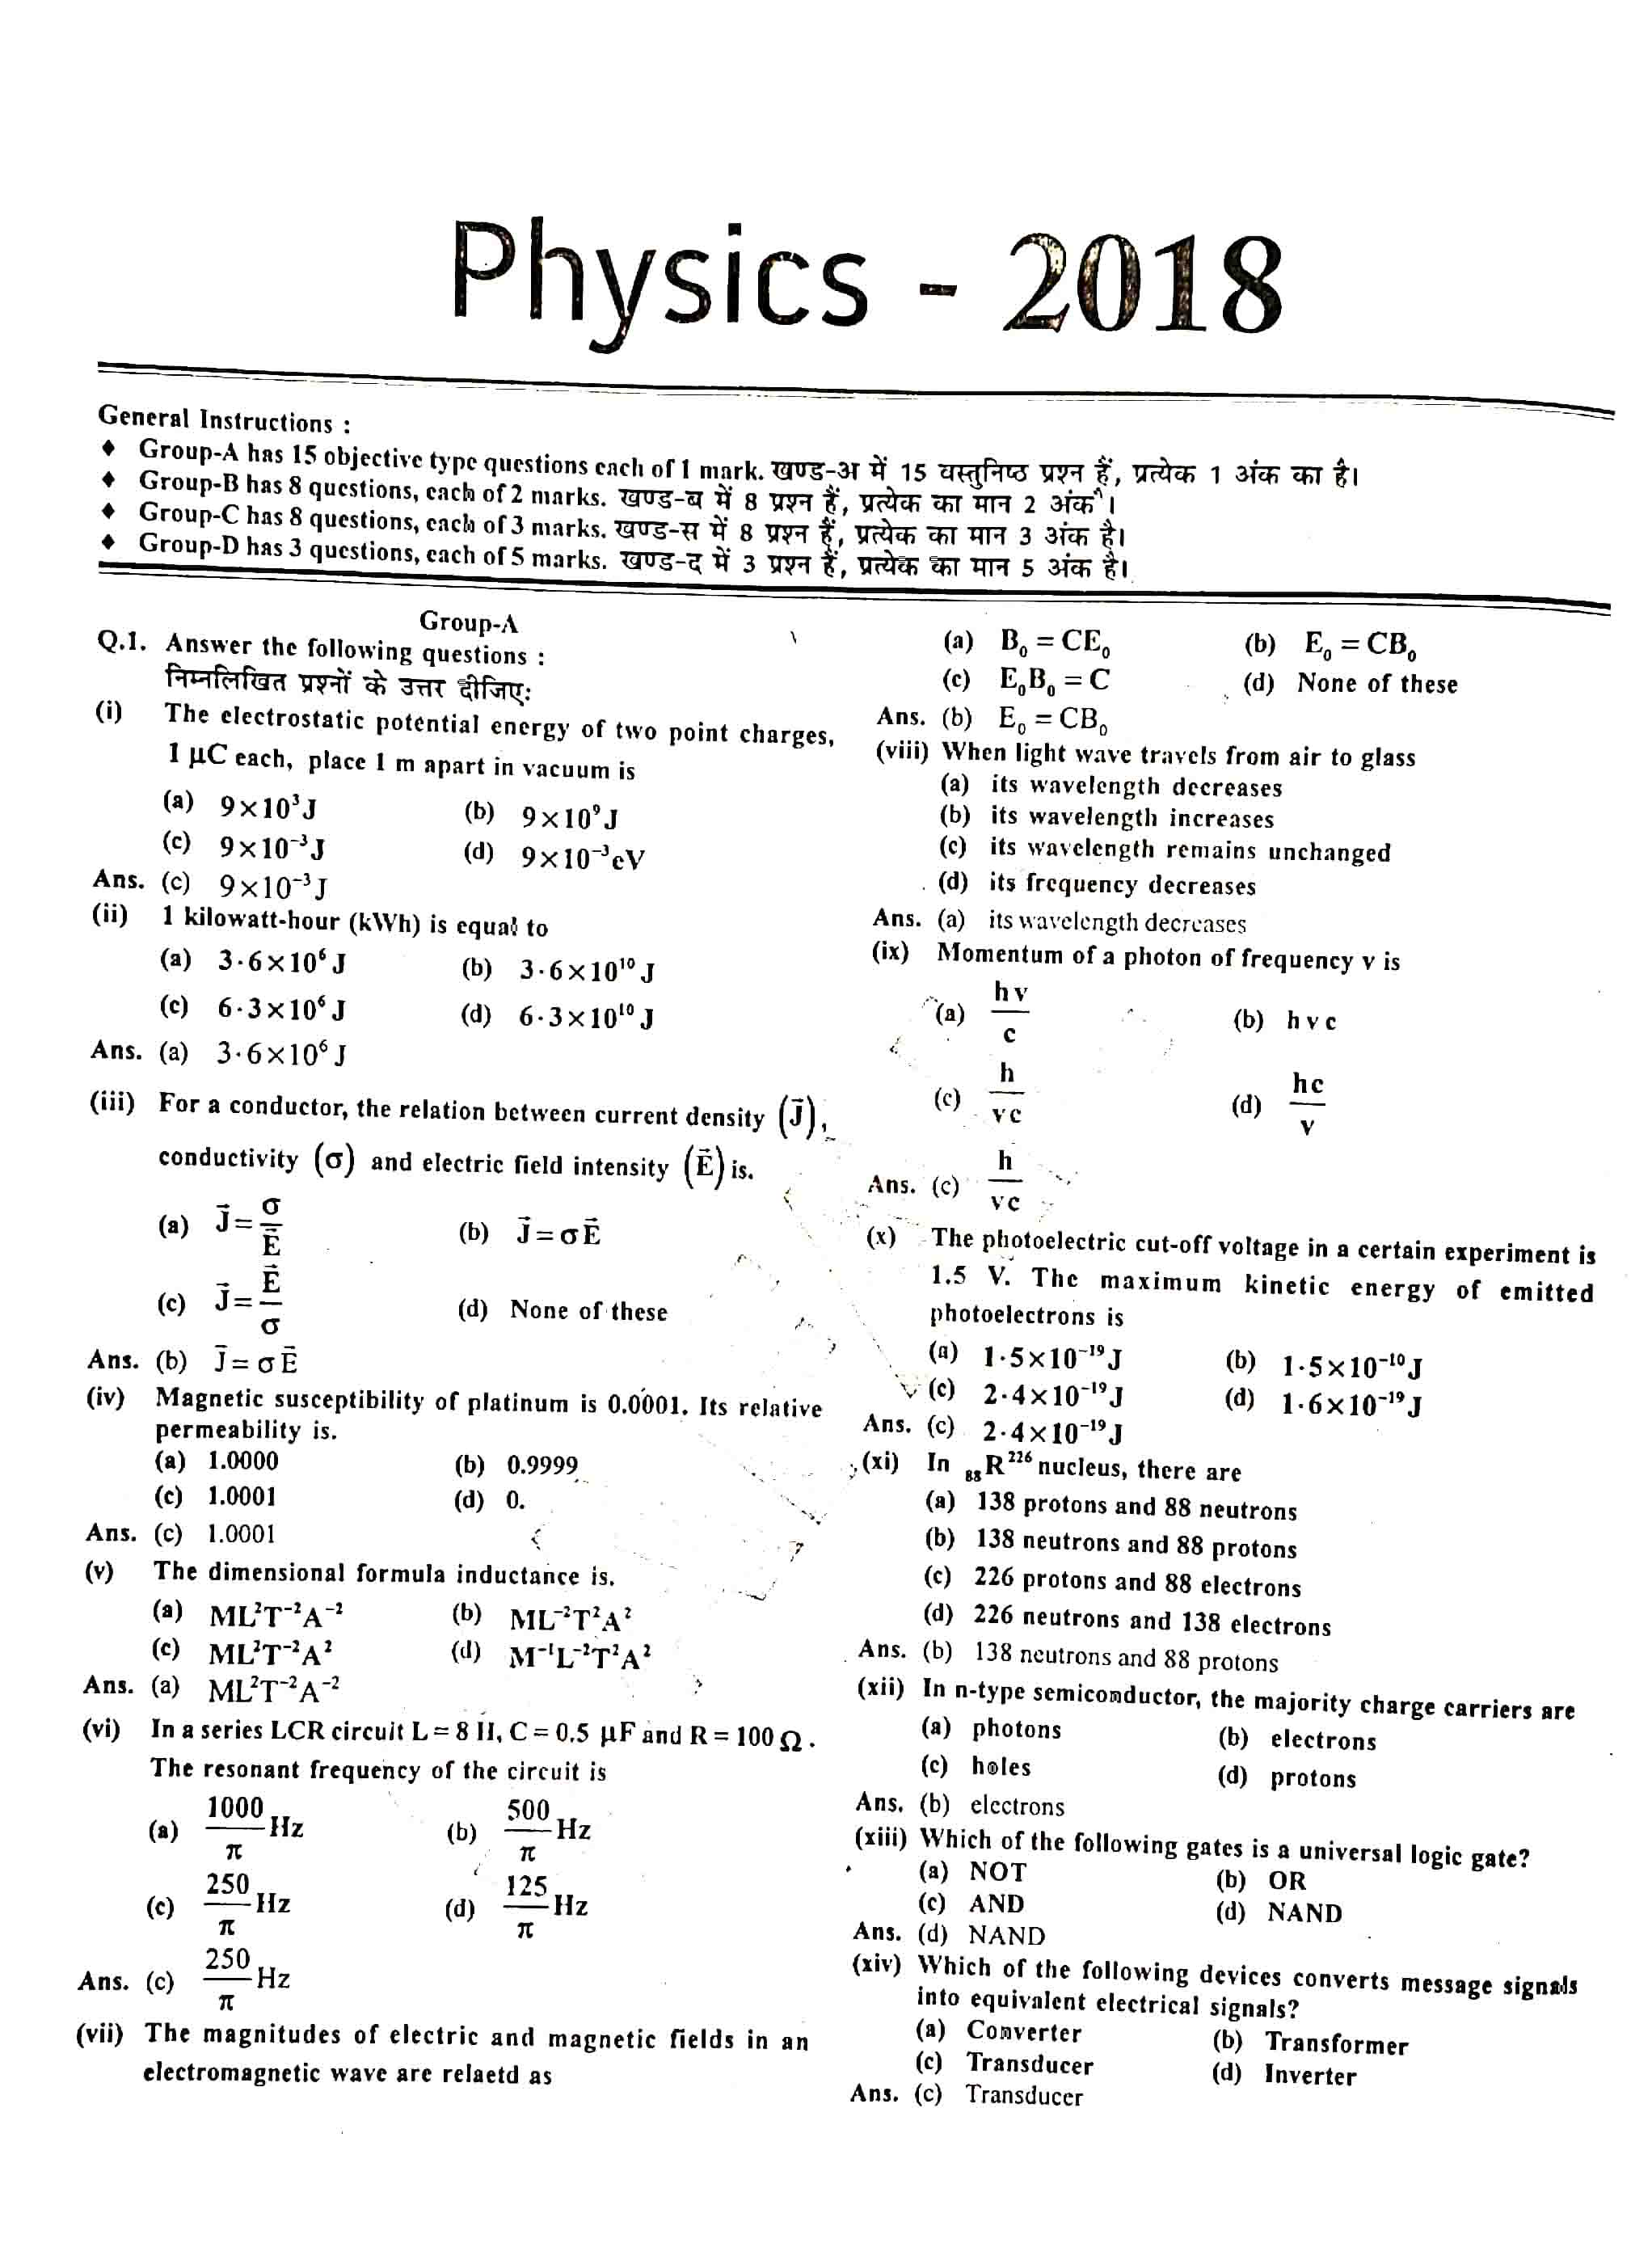 JAC Class 12 Physics 2018 Question Paper 01